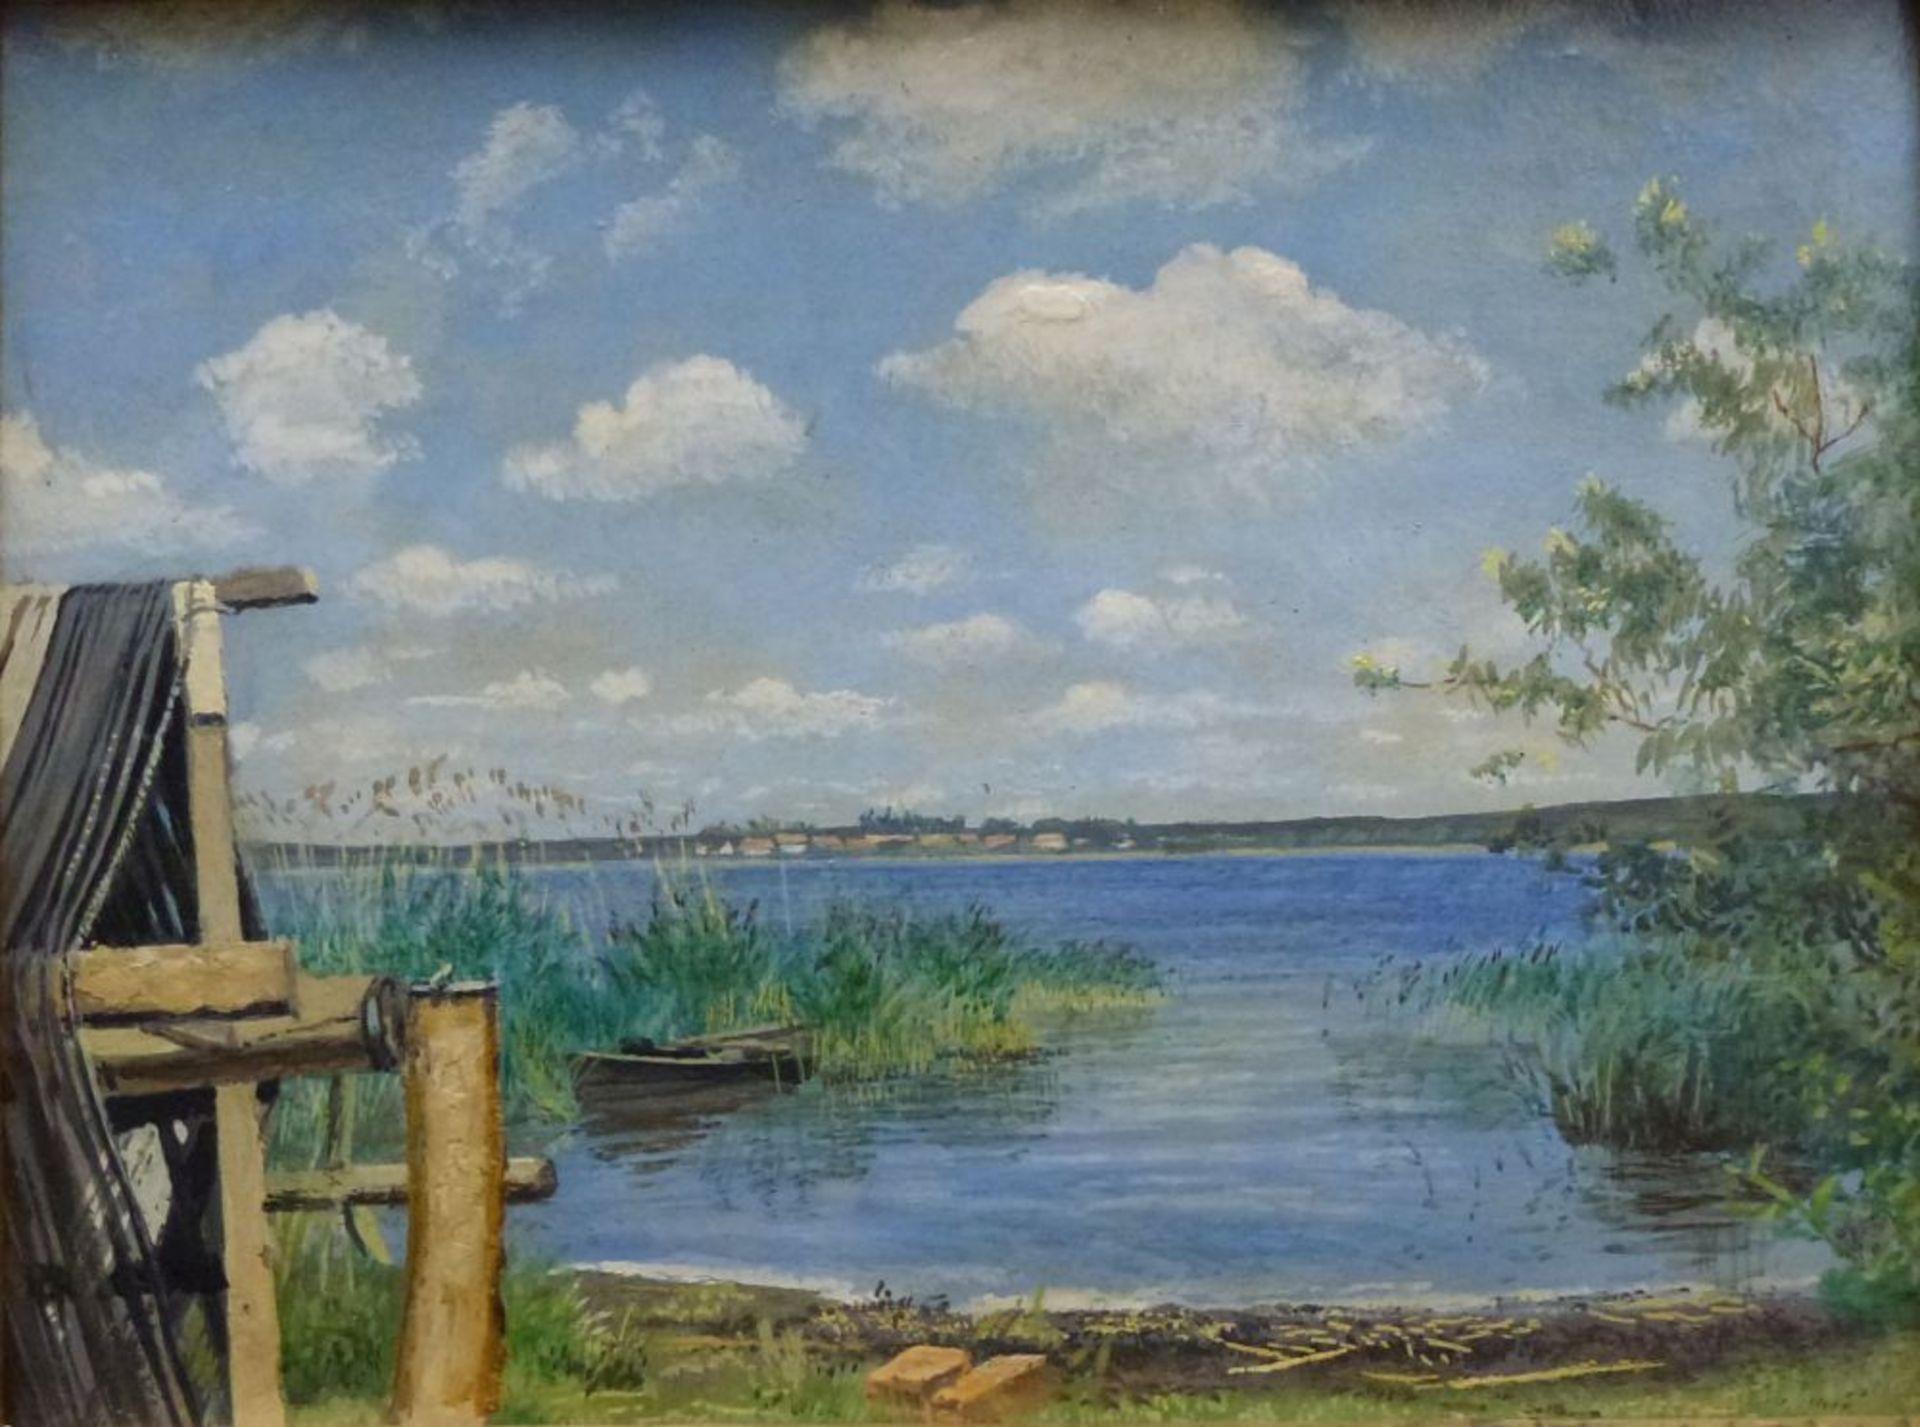 Los 35 - Dümmer See, 1.Hälfte 20.Jh.Öl/Platte, rücks. bez. Erwin Kröner, Blick über den See auf Dorf, alte